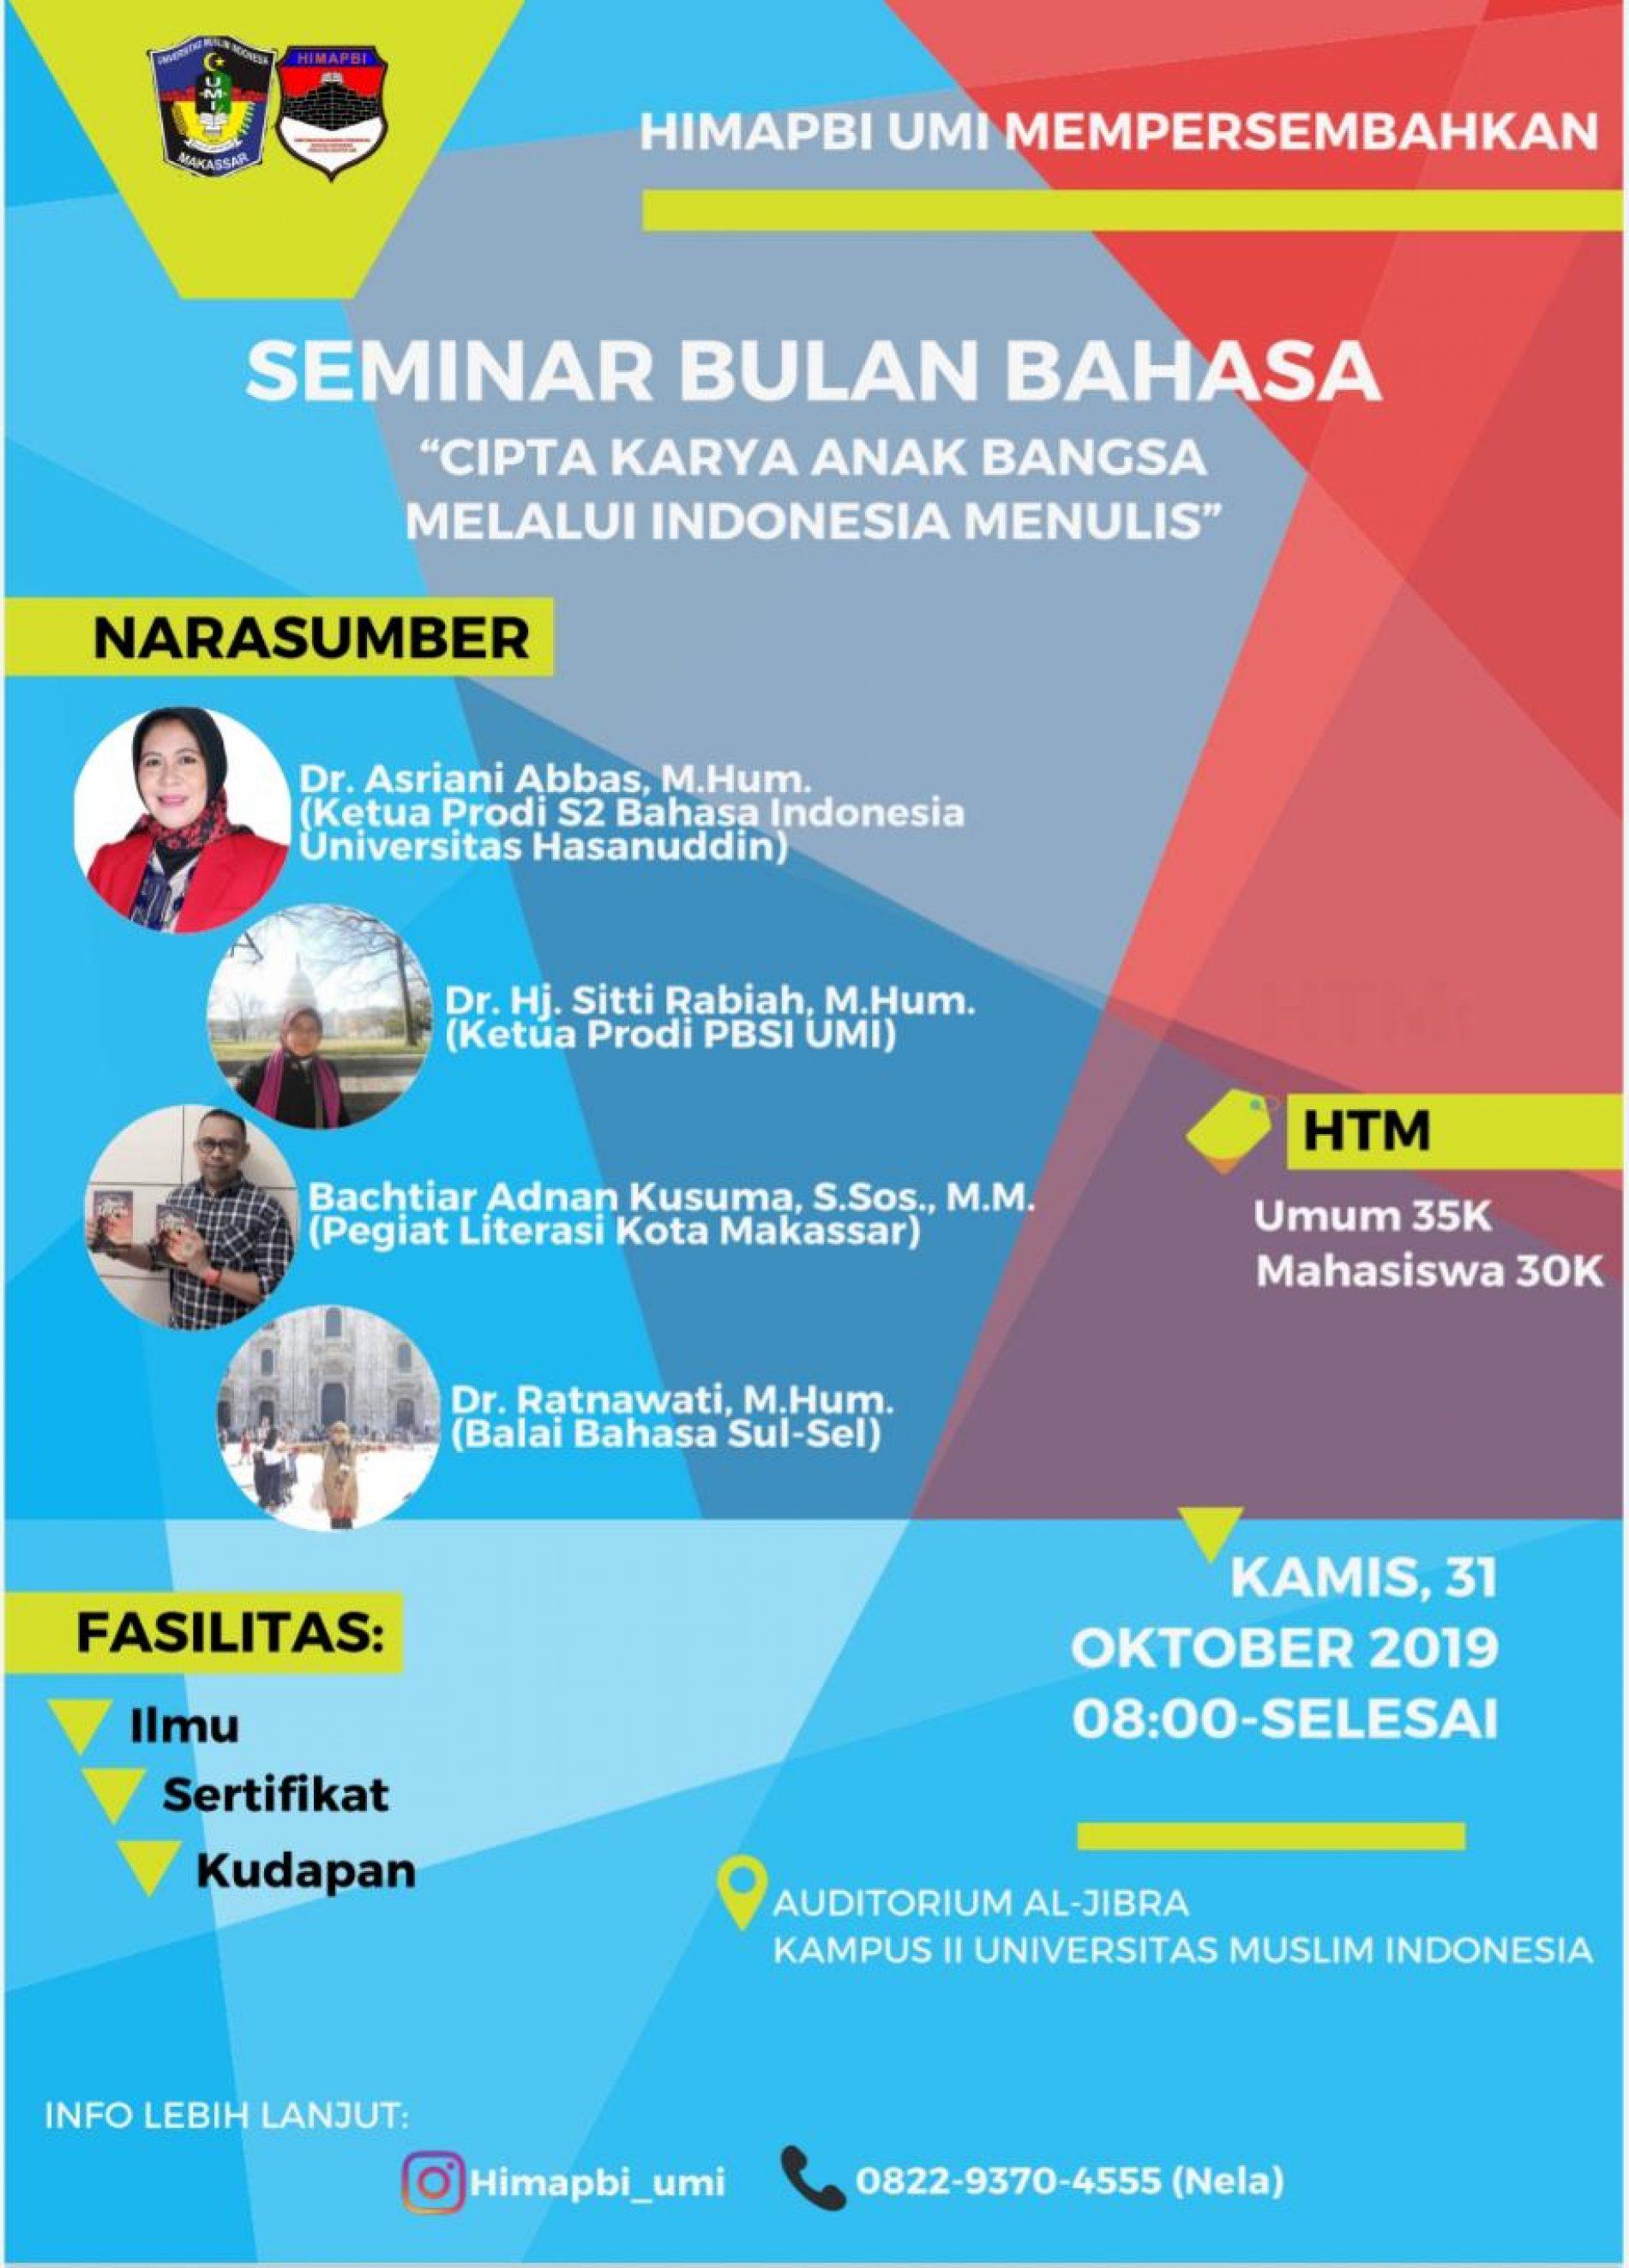 Seminar Bulan Bahasa dan Lomba Karya Tulis Ilmiah 2019